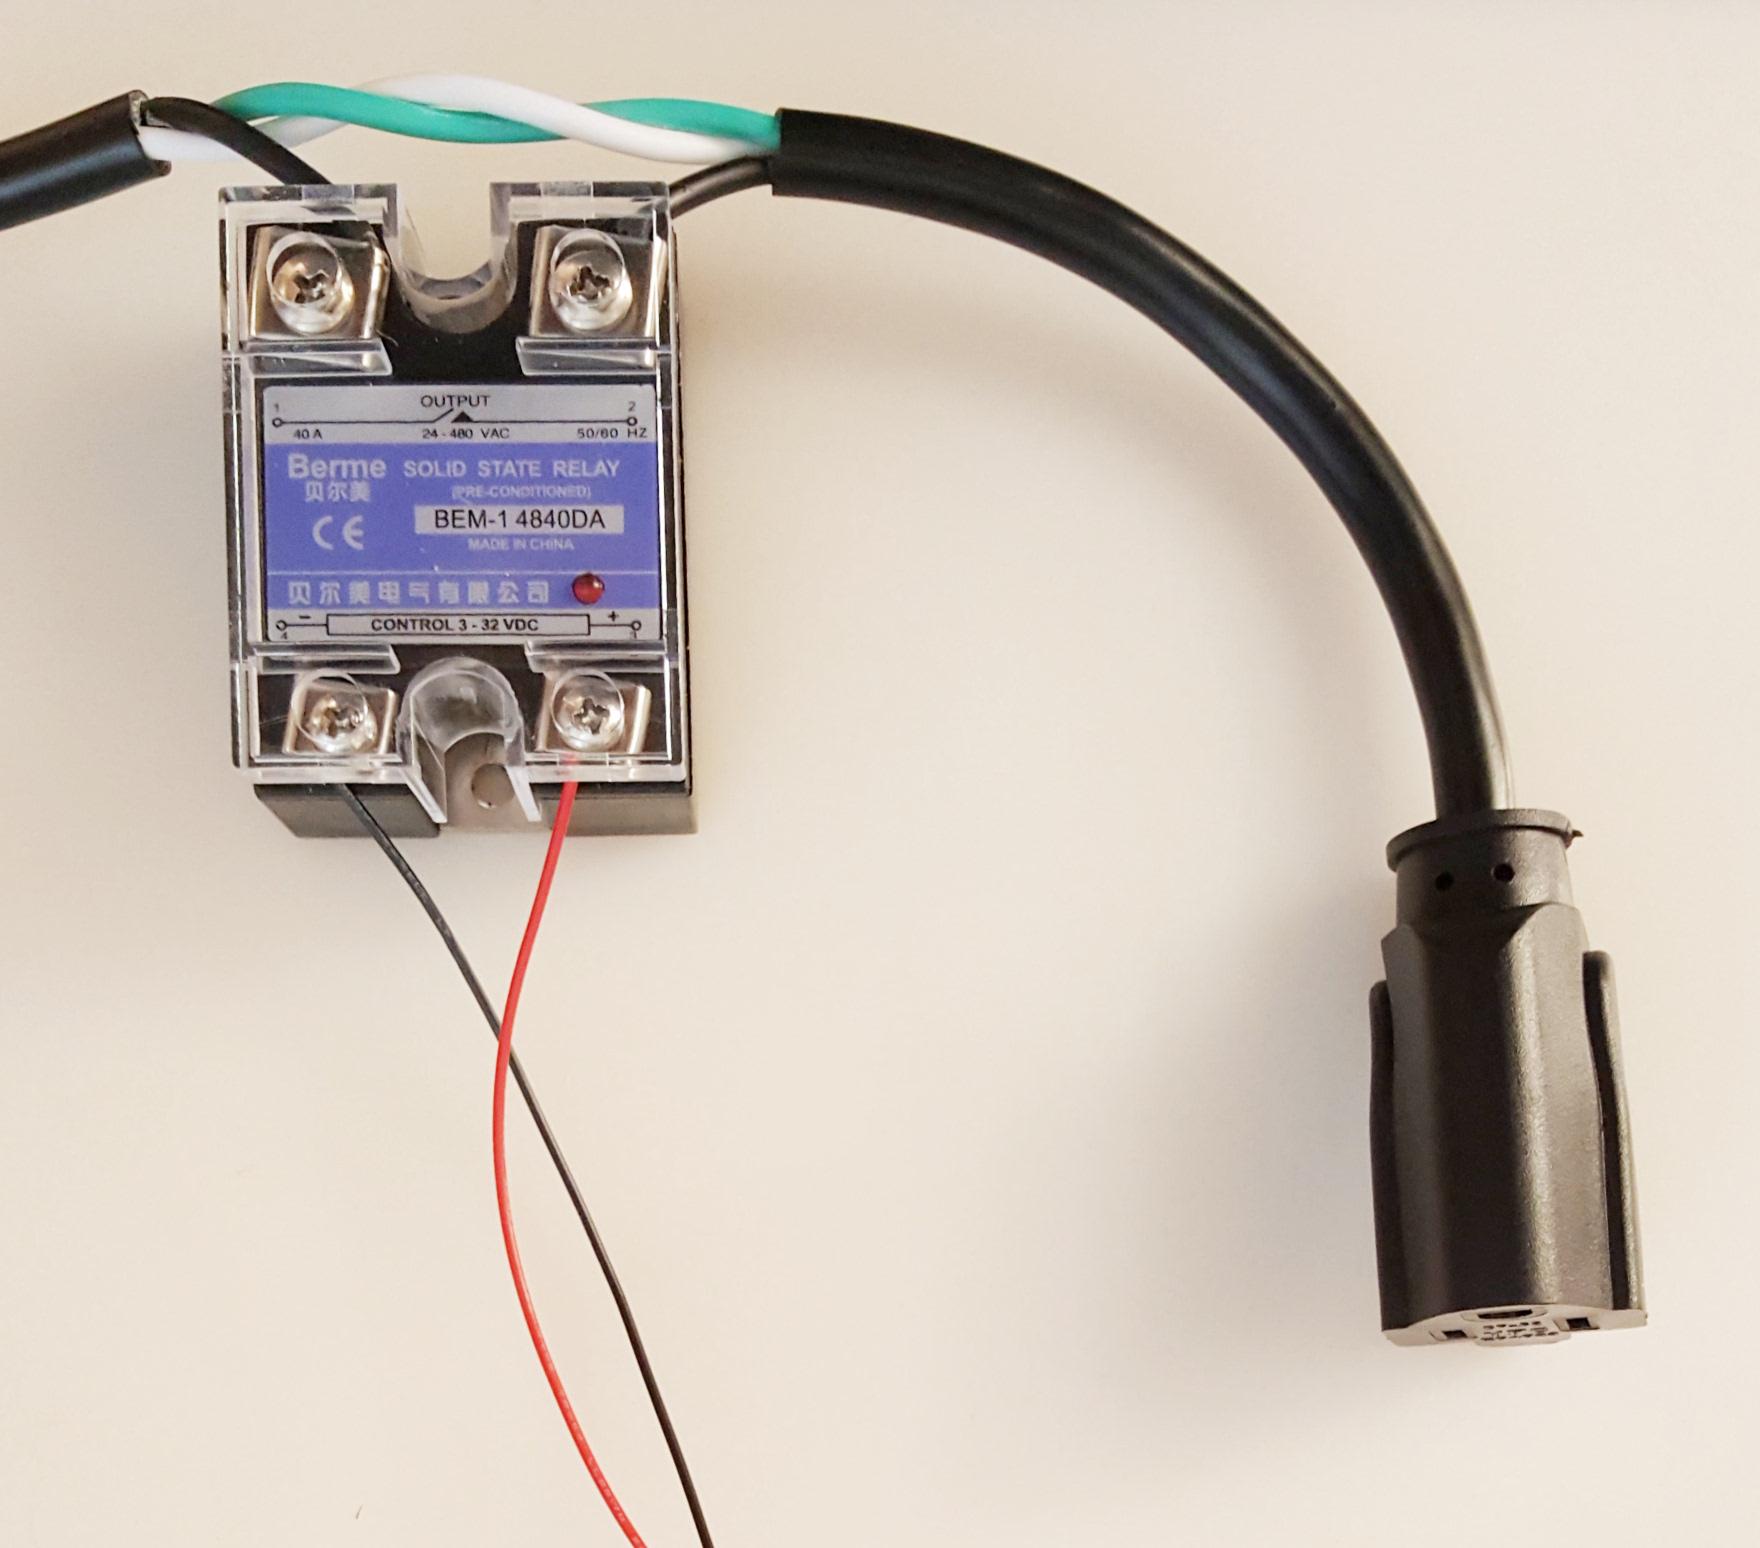 hight resolution of  electro permanent motor control allegro ti trinamic pololu tinyg ramps mechaduino nrf52 ddmc solid state relay ac vs dc ic hockey puck wiring